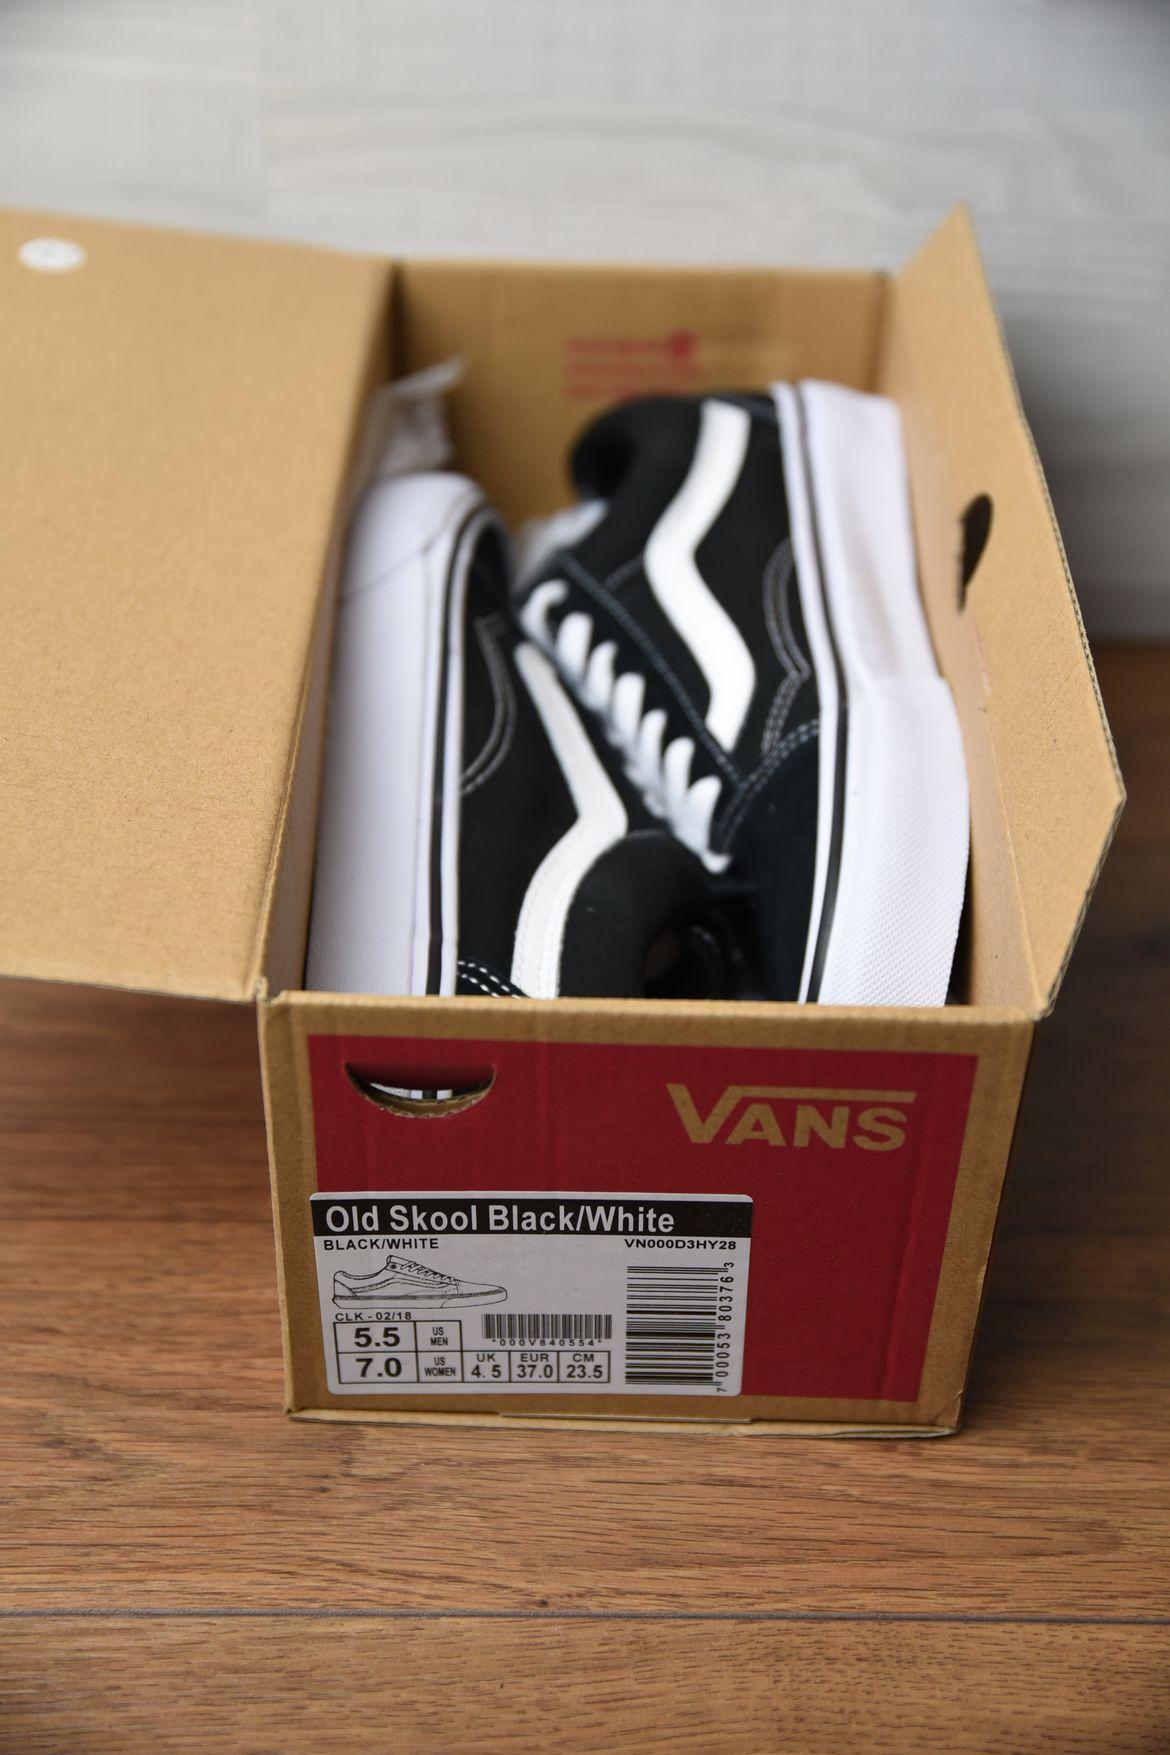 Original Vans Box